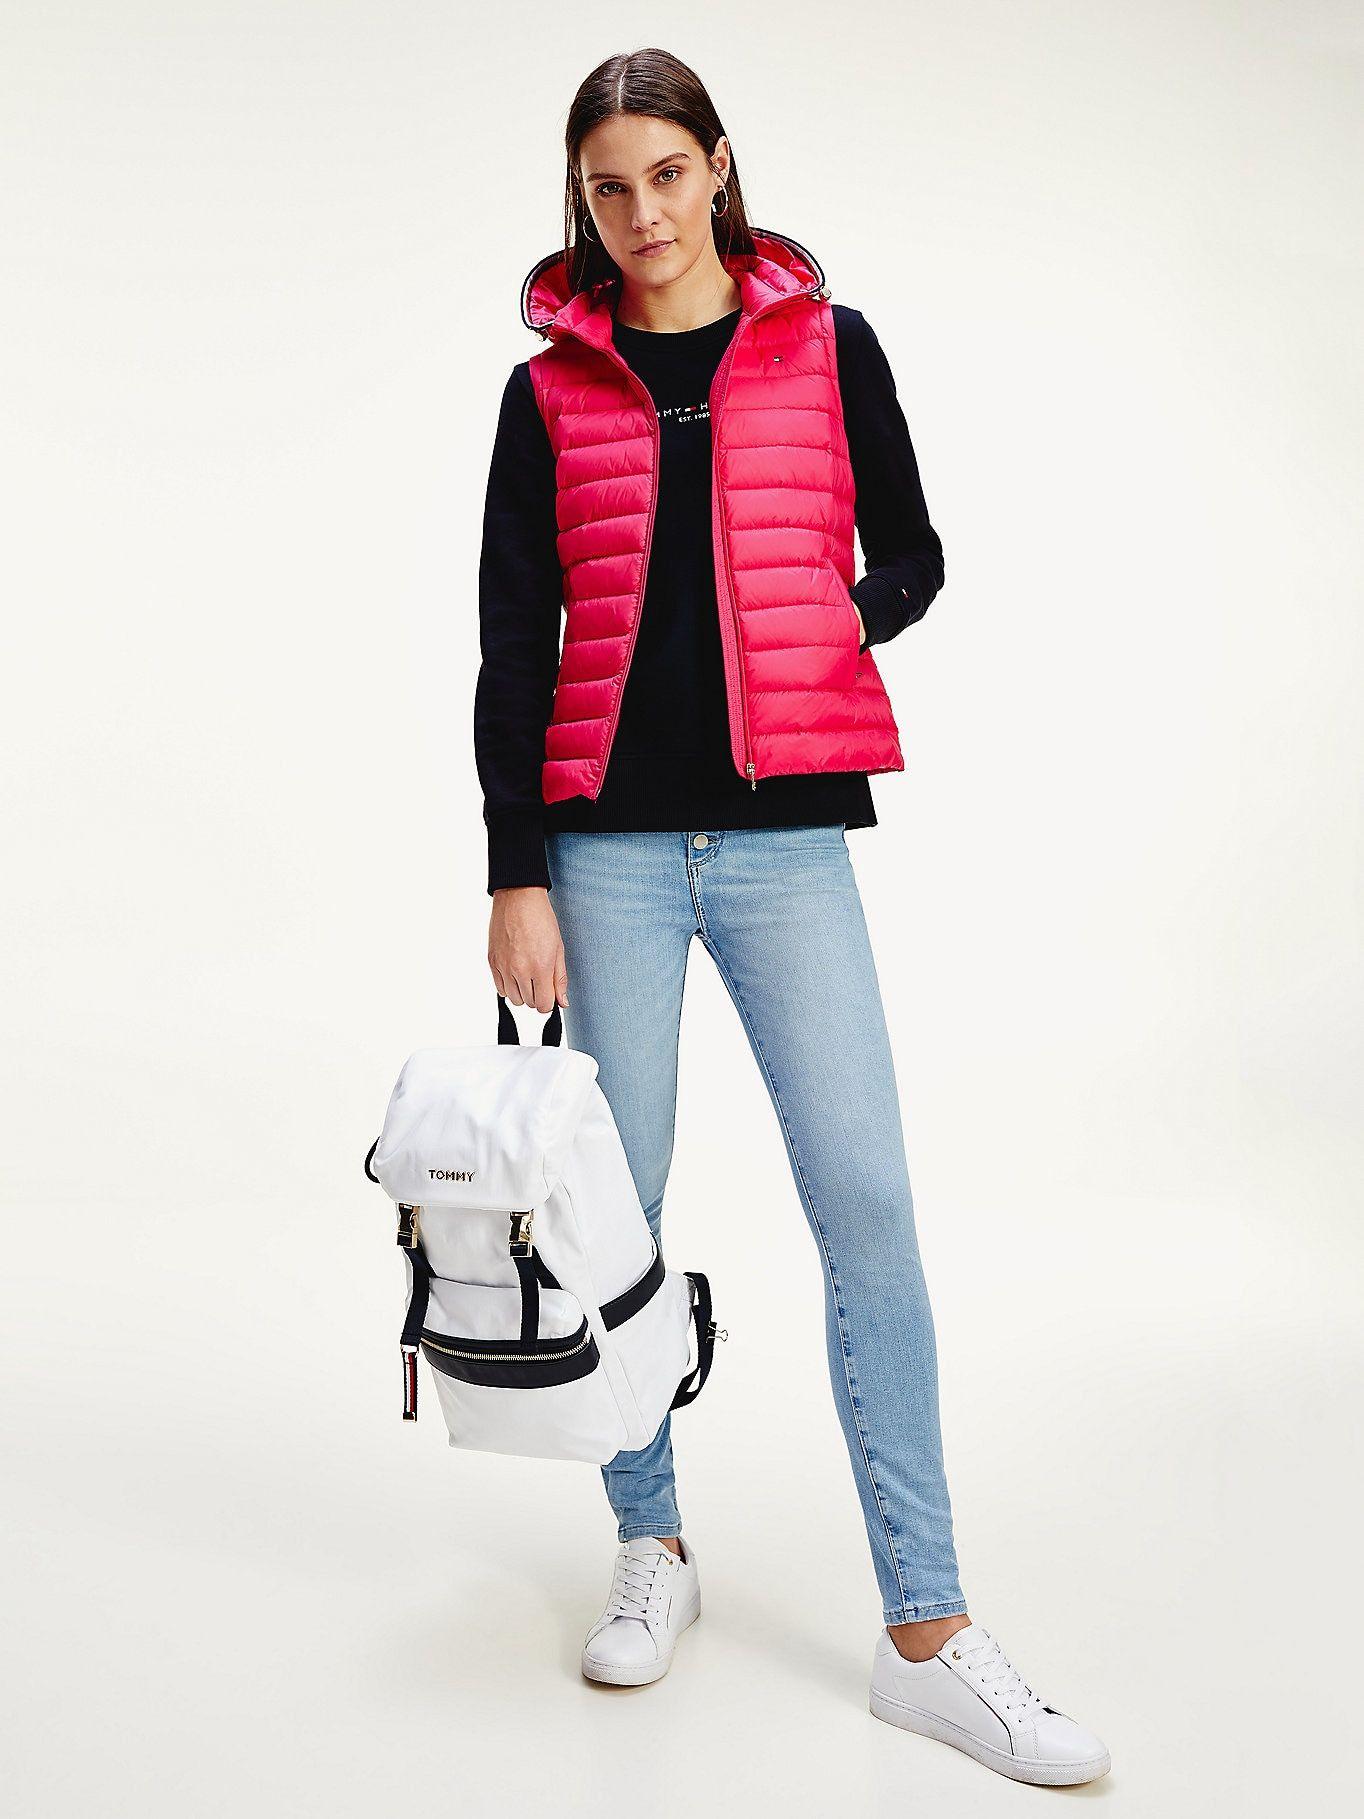 Essentials Packable Down Vest Pink Tommy Hilfiger Women S Coats Jackets Outerwear Jackets Hilfiger [ 1819 x 1364 Pixel ]